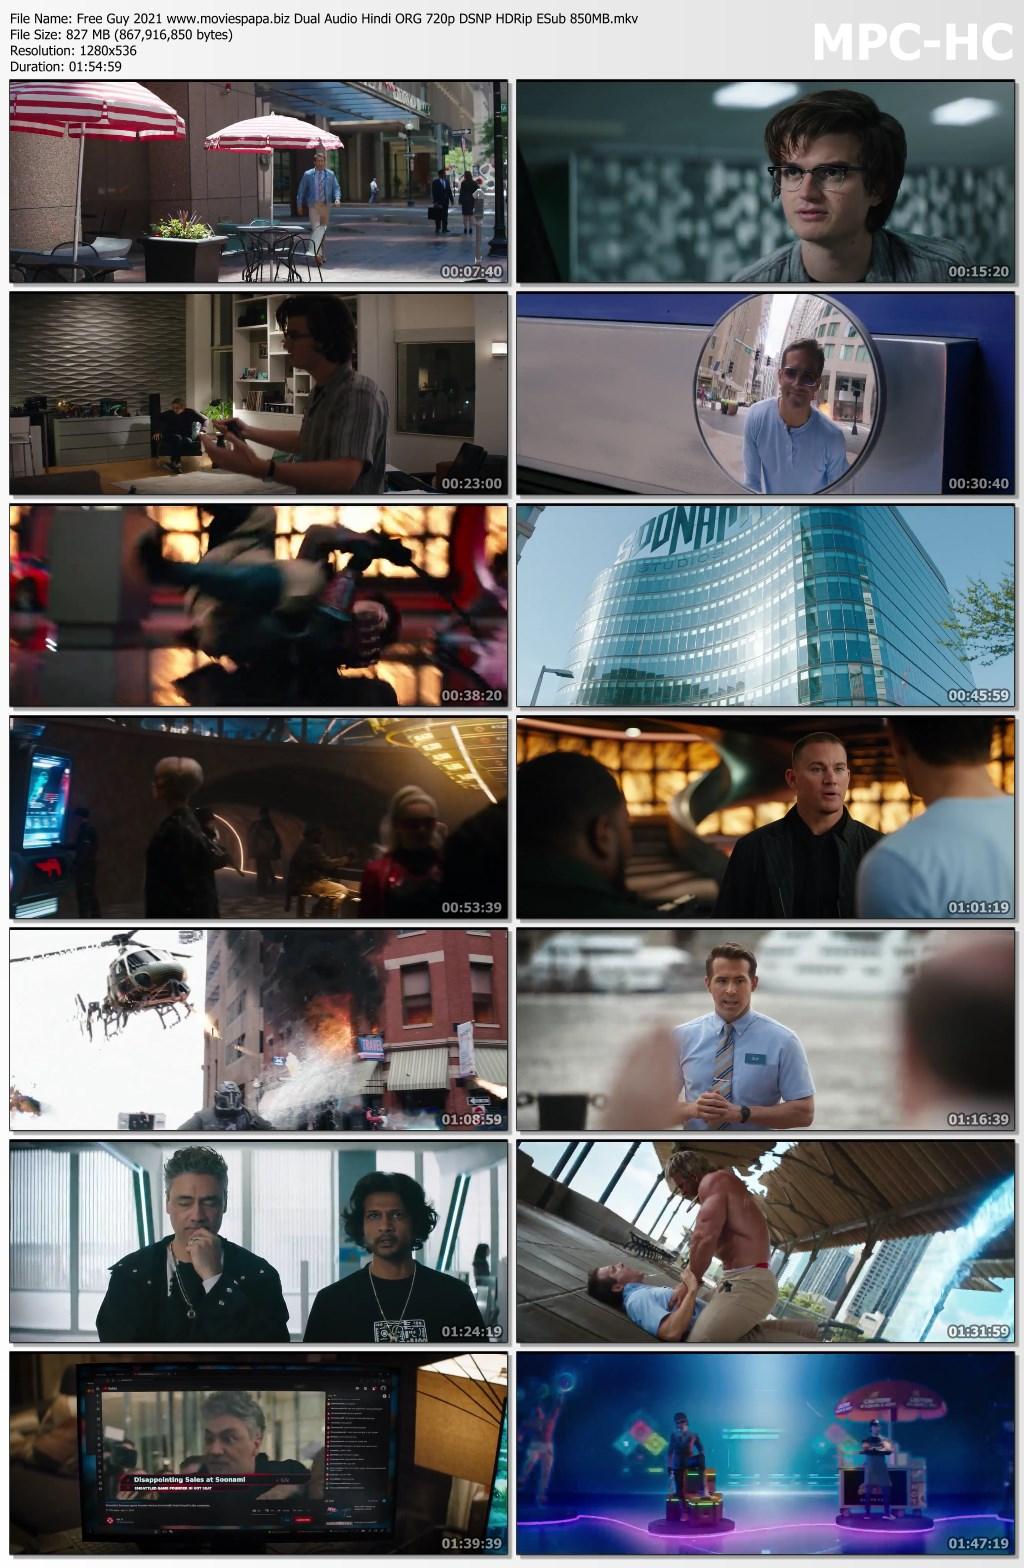 Free Guy 2021 screenshot HDMoviesFair